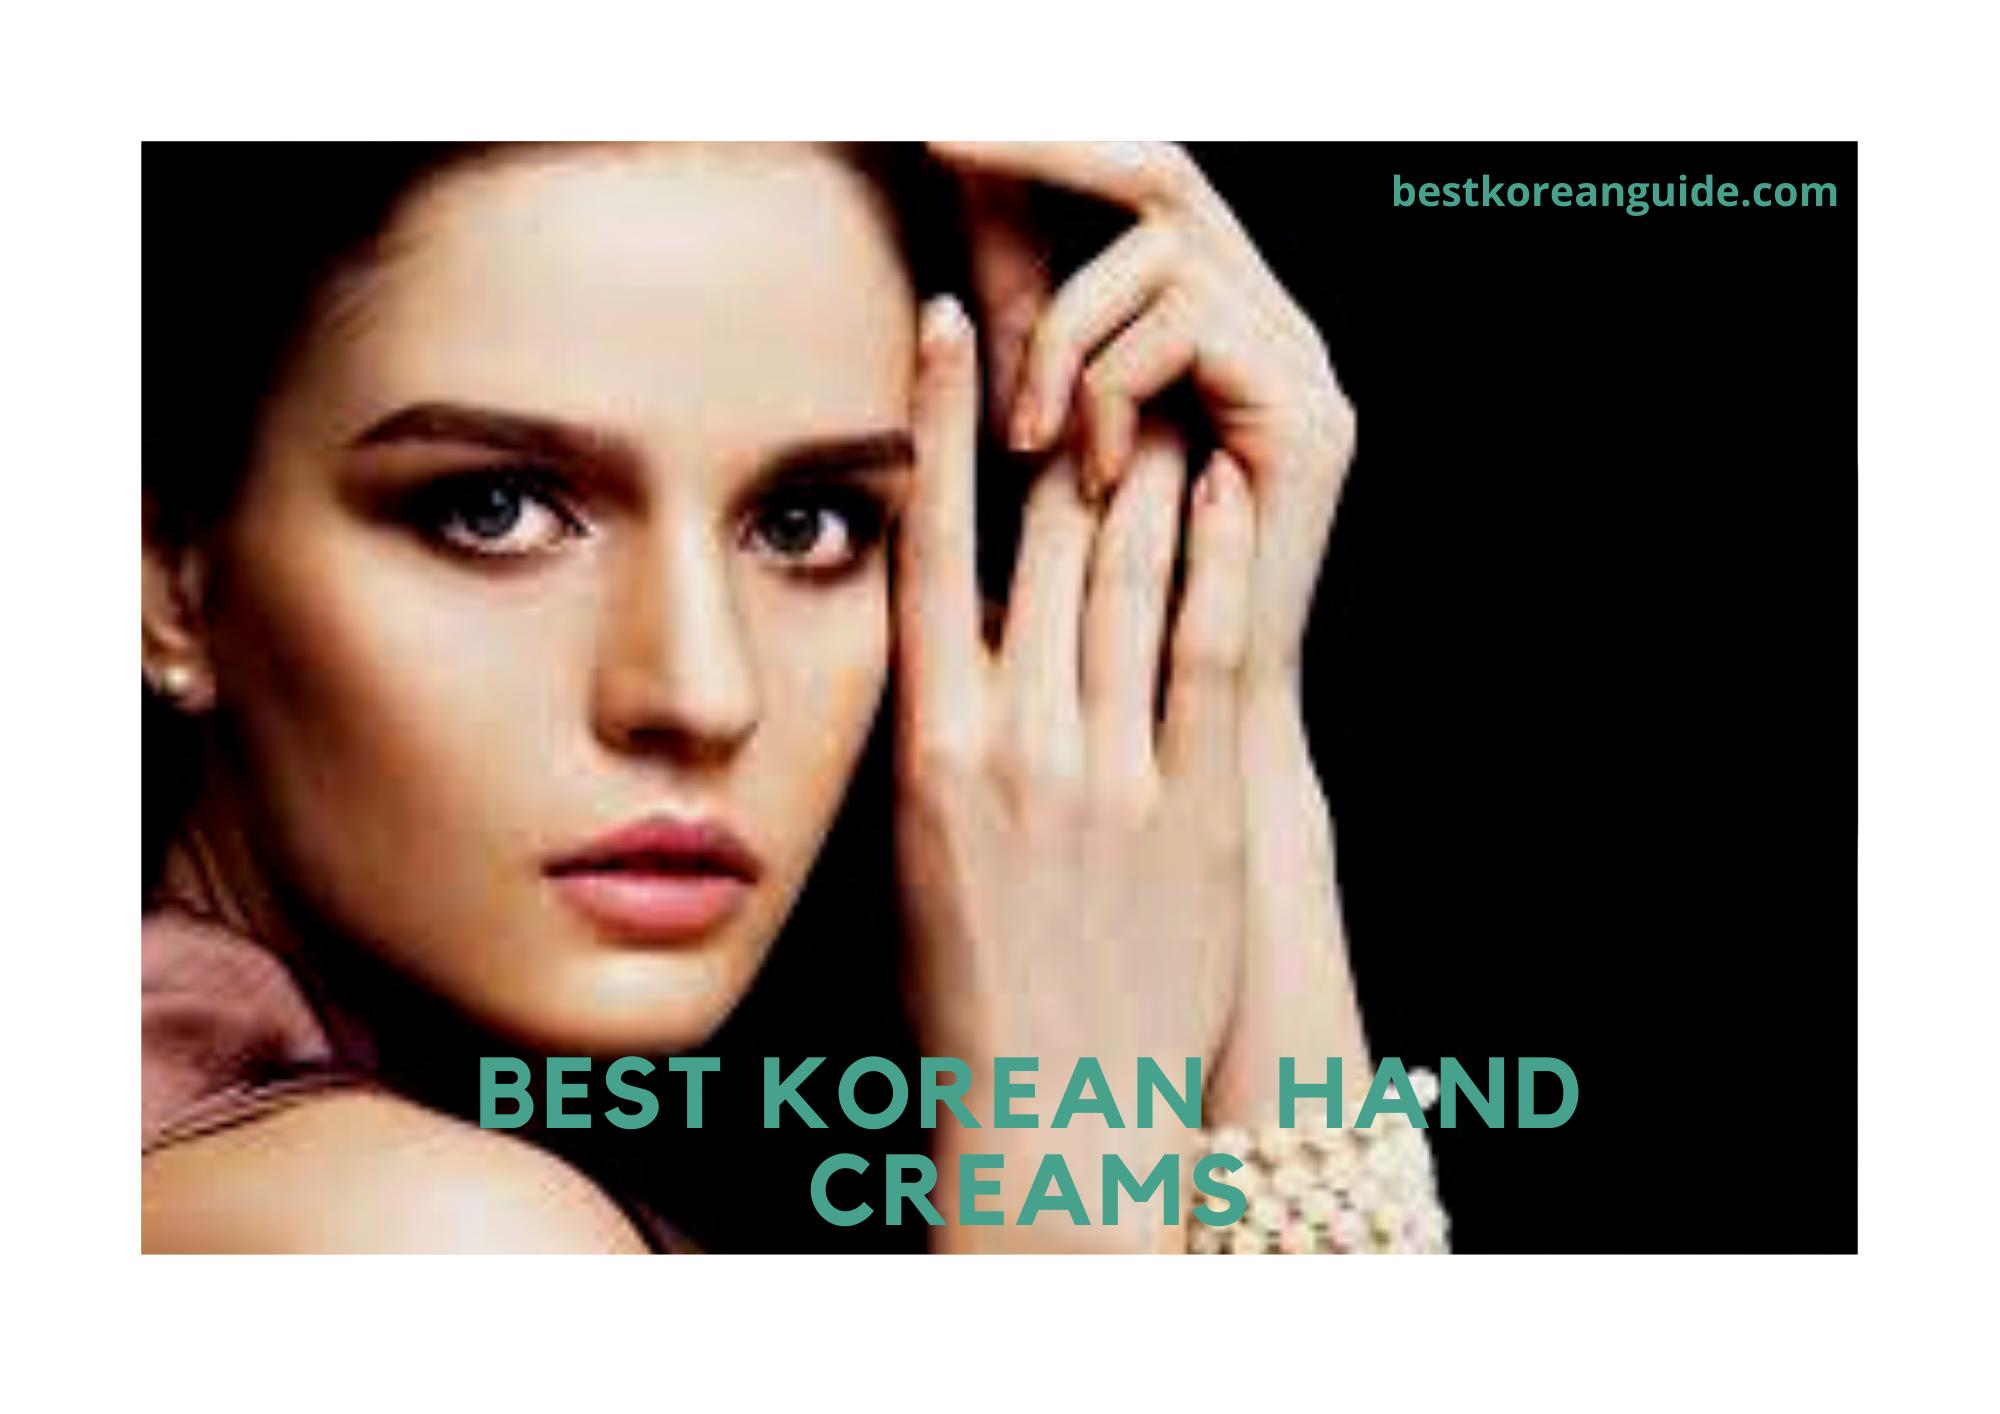 BEST KOREAN HAND CREAMS